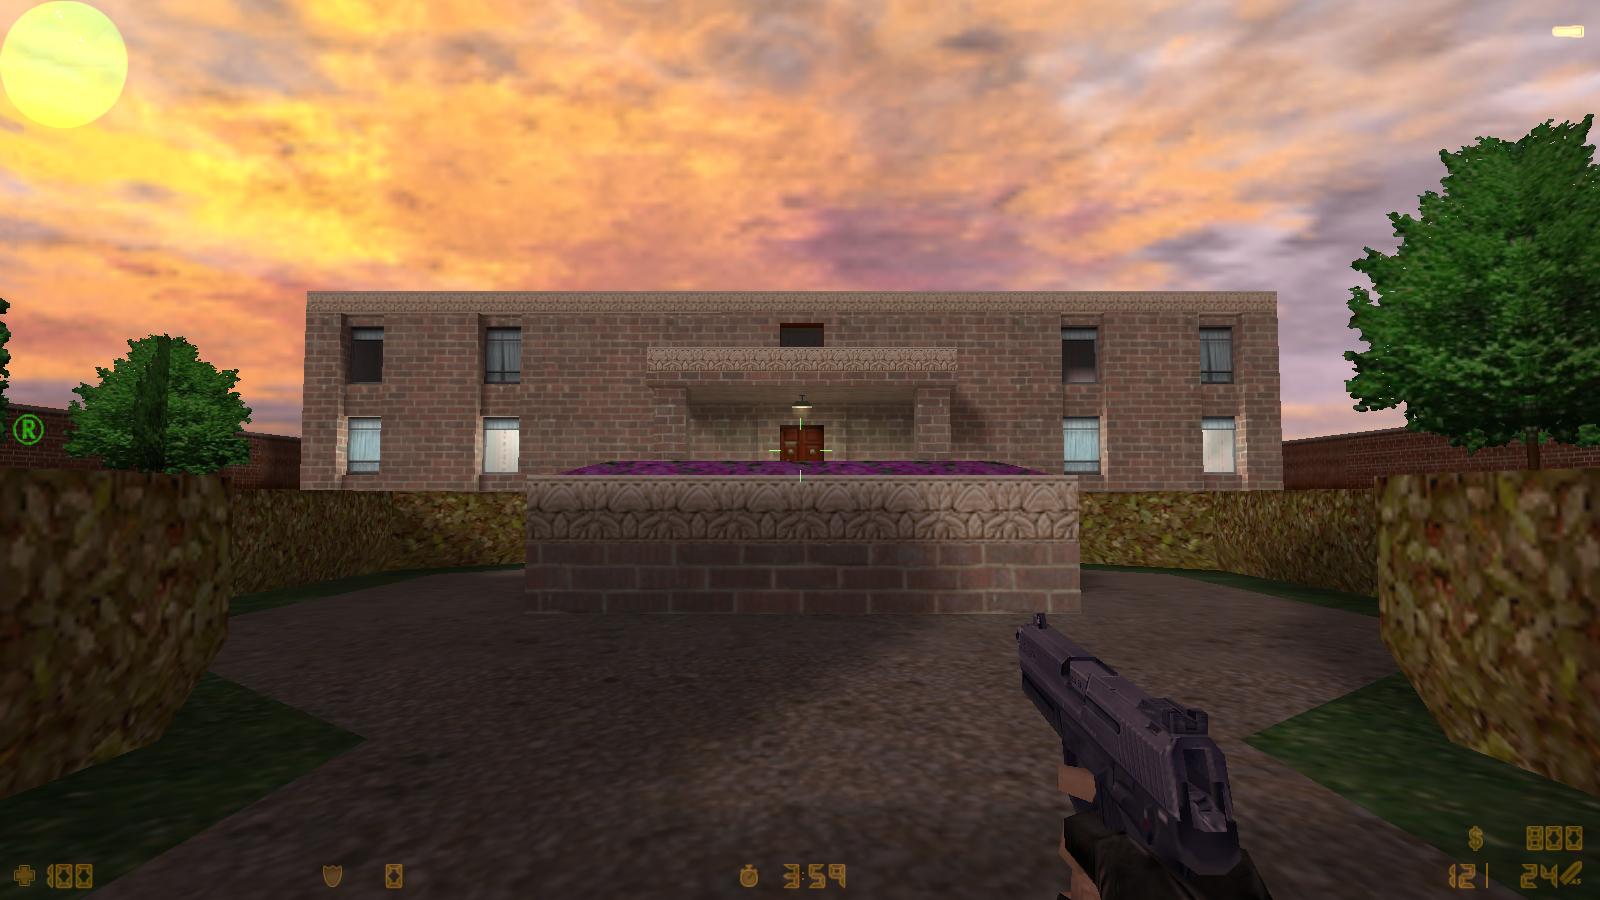 Estate | Counter-Strike Wiki | Fandom